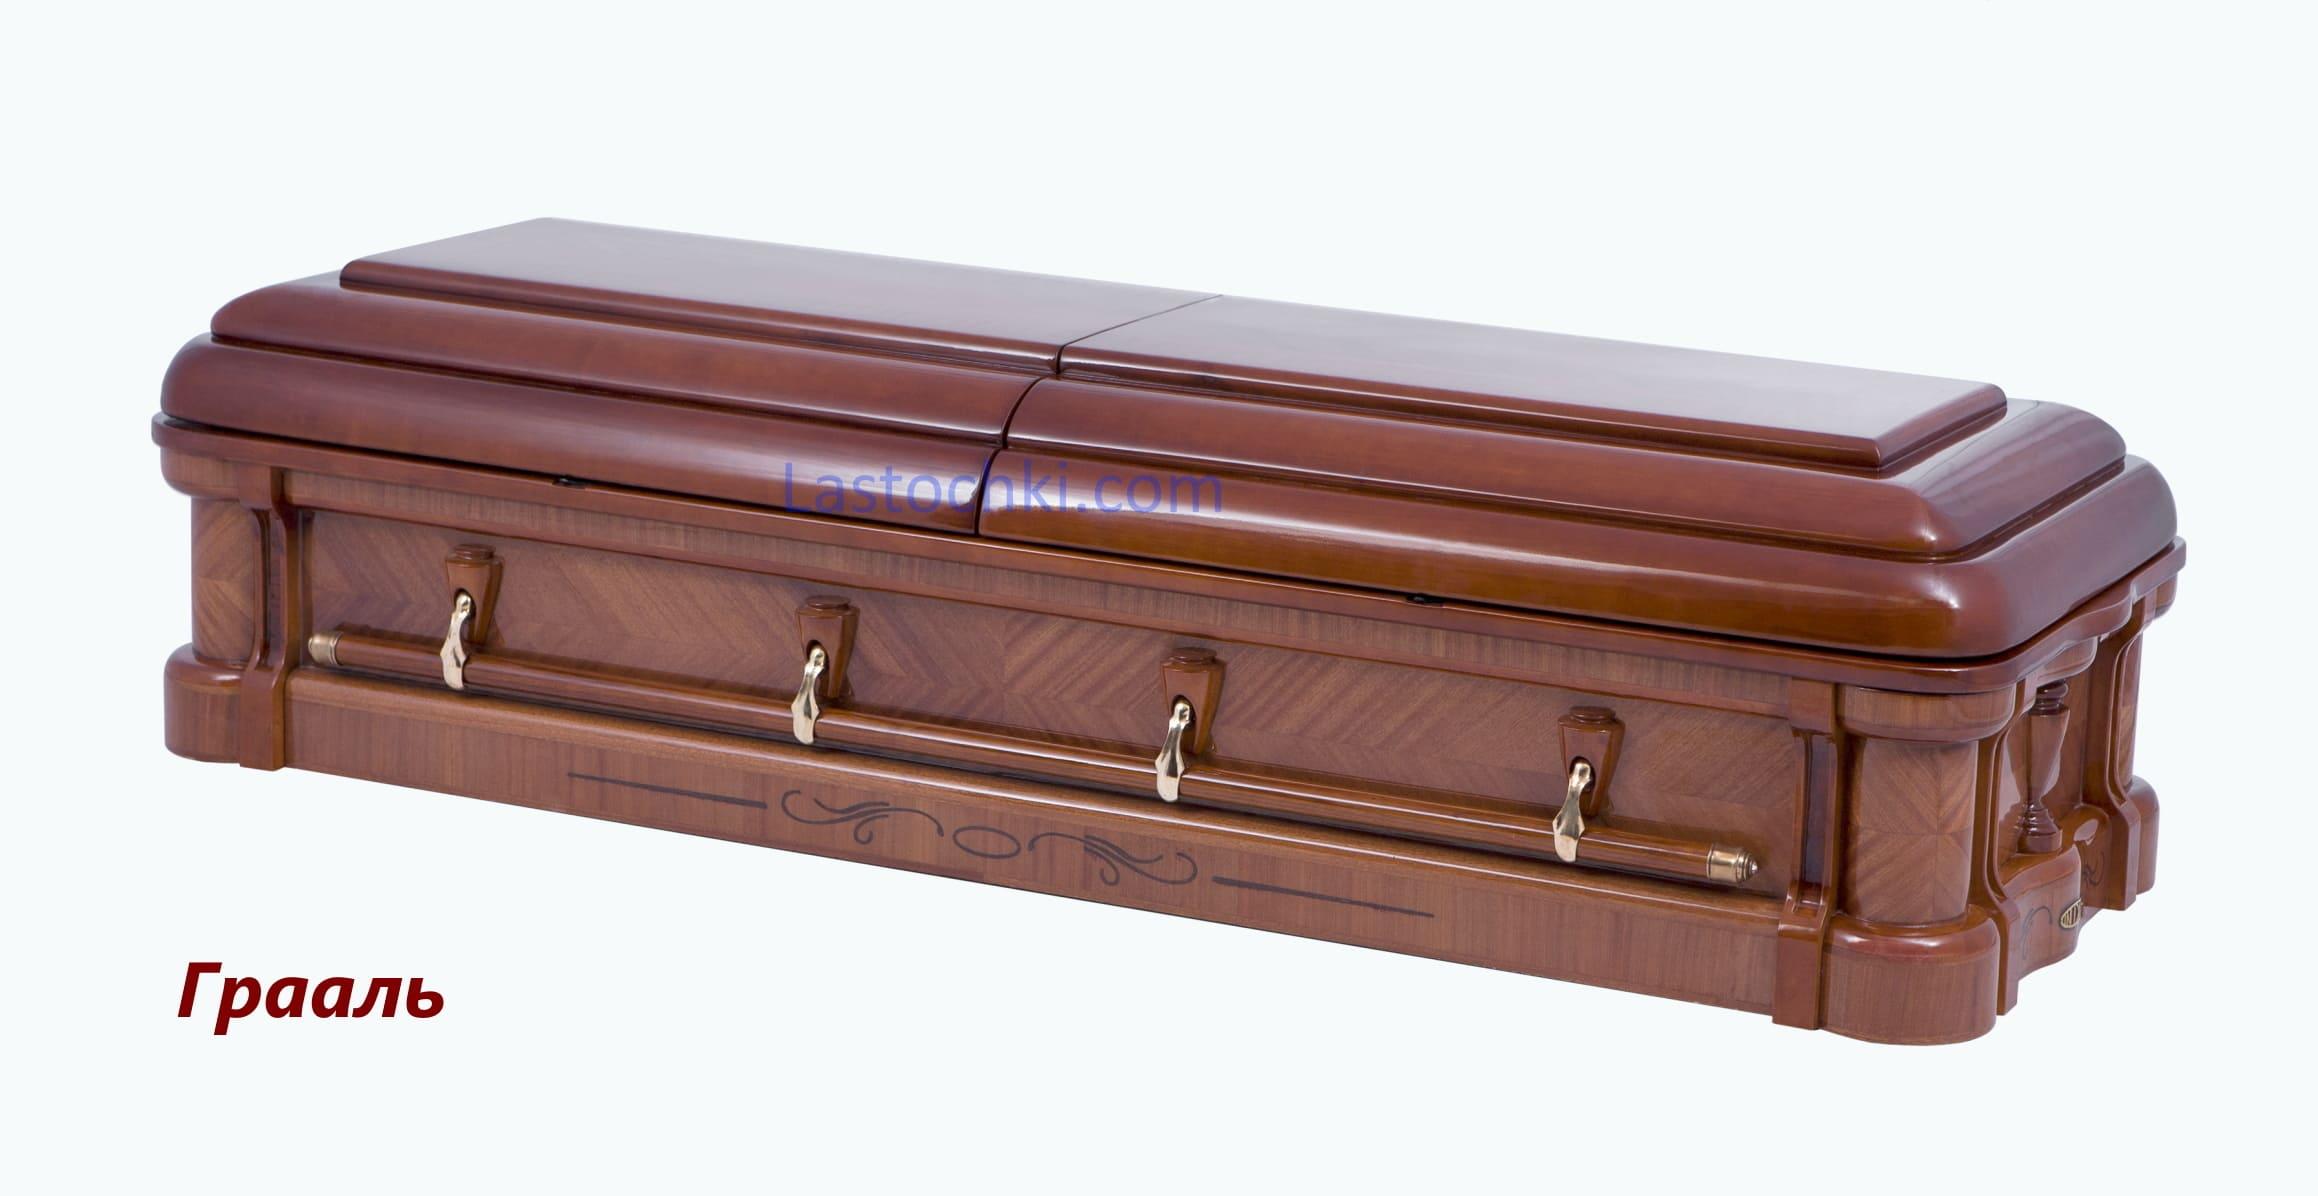 Саркофаг Грааль инкрустированый  -  Цена 300 000 грн